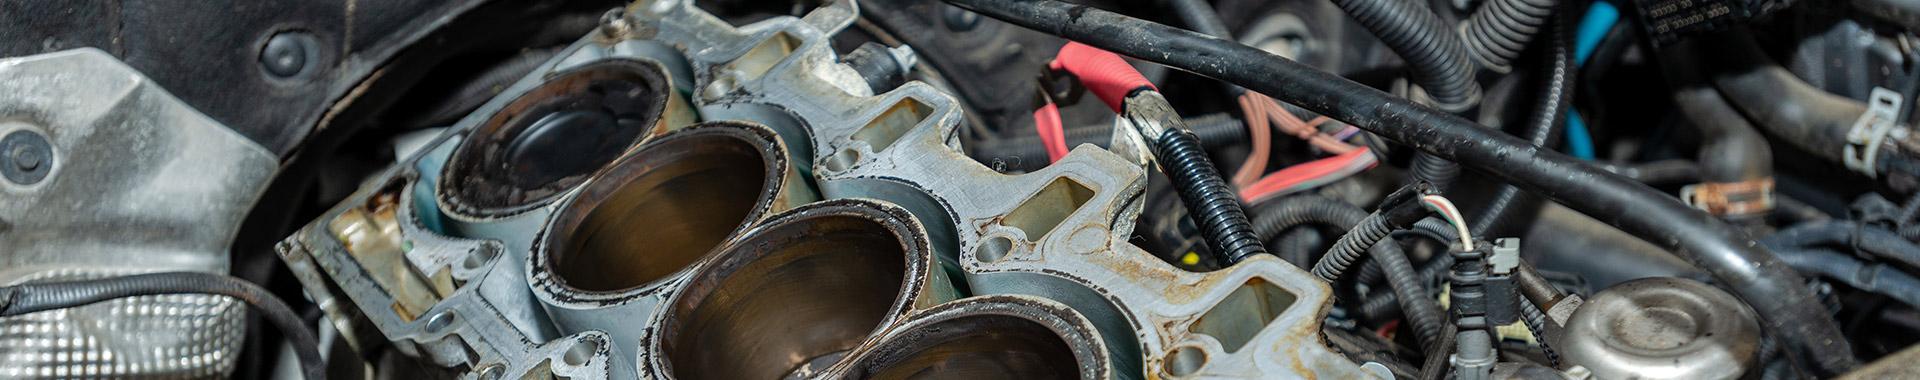 Hydro-Locked Engine